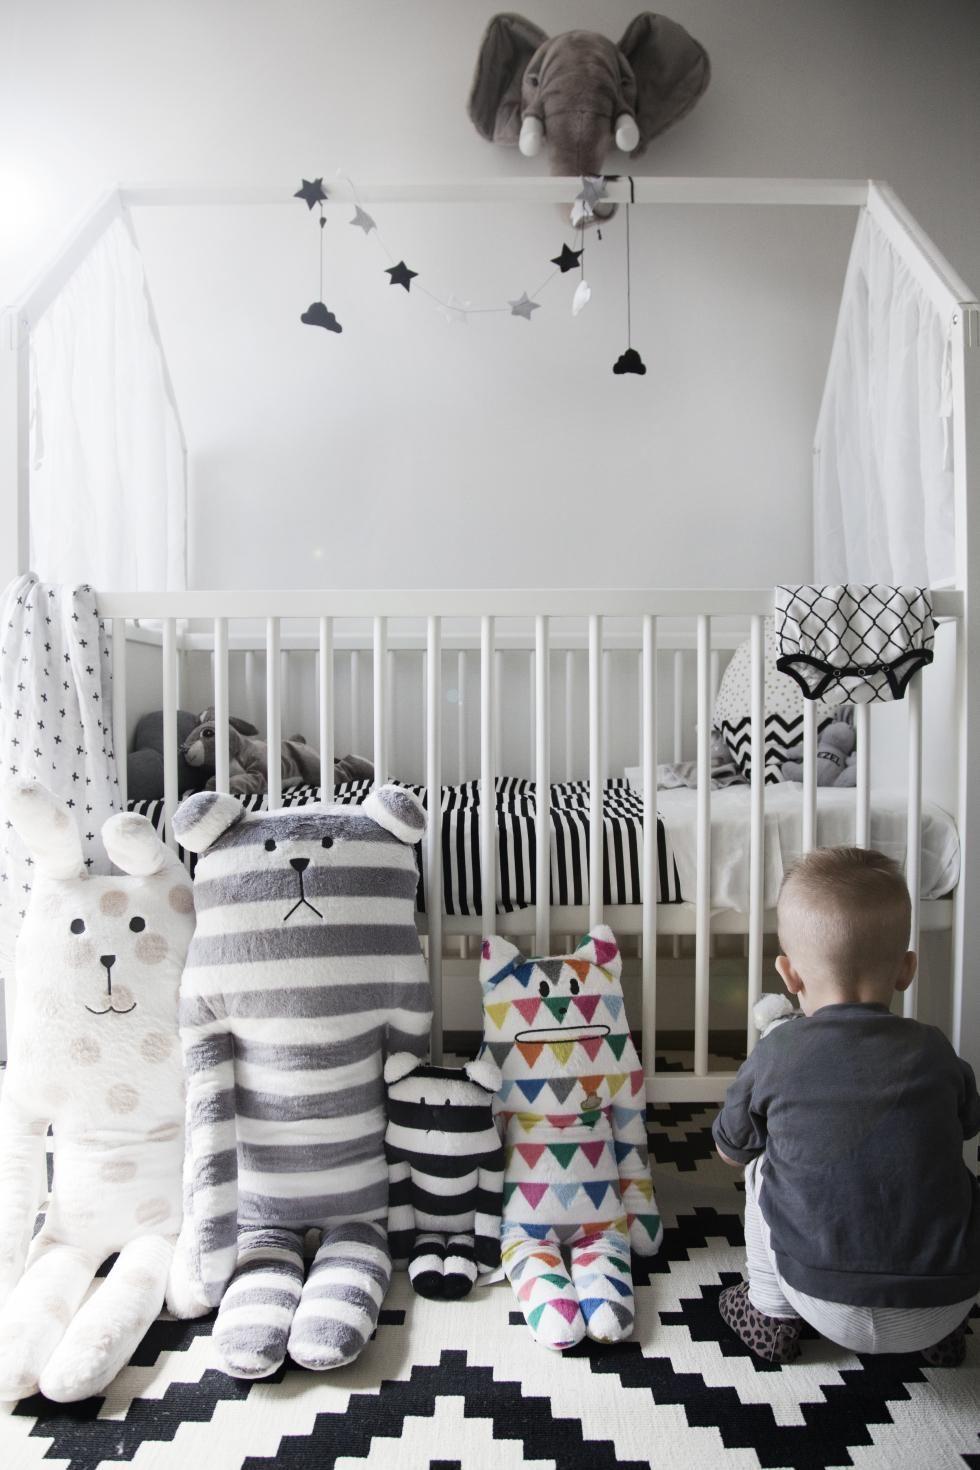 Crib for sale london ontario - Stunning Scandinavian Inspired Nursery Featured Stokke Home Crib In White